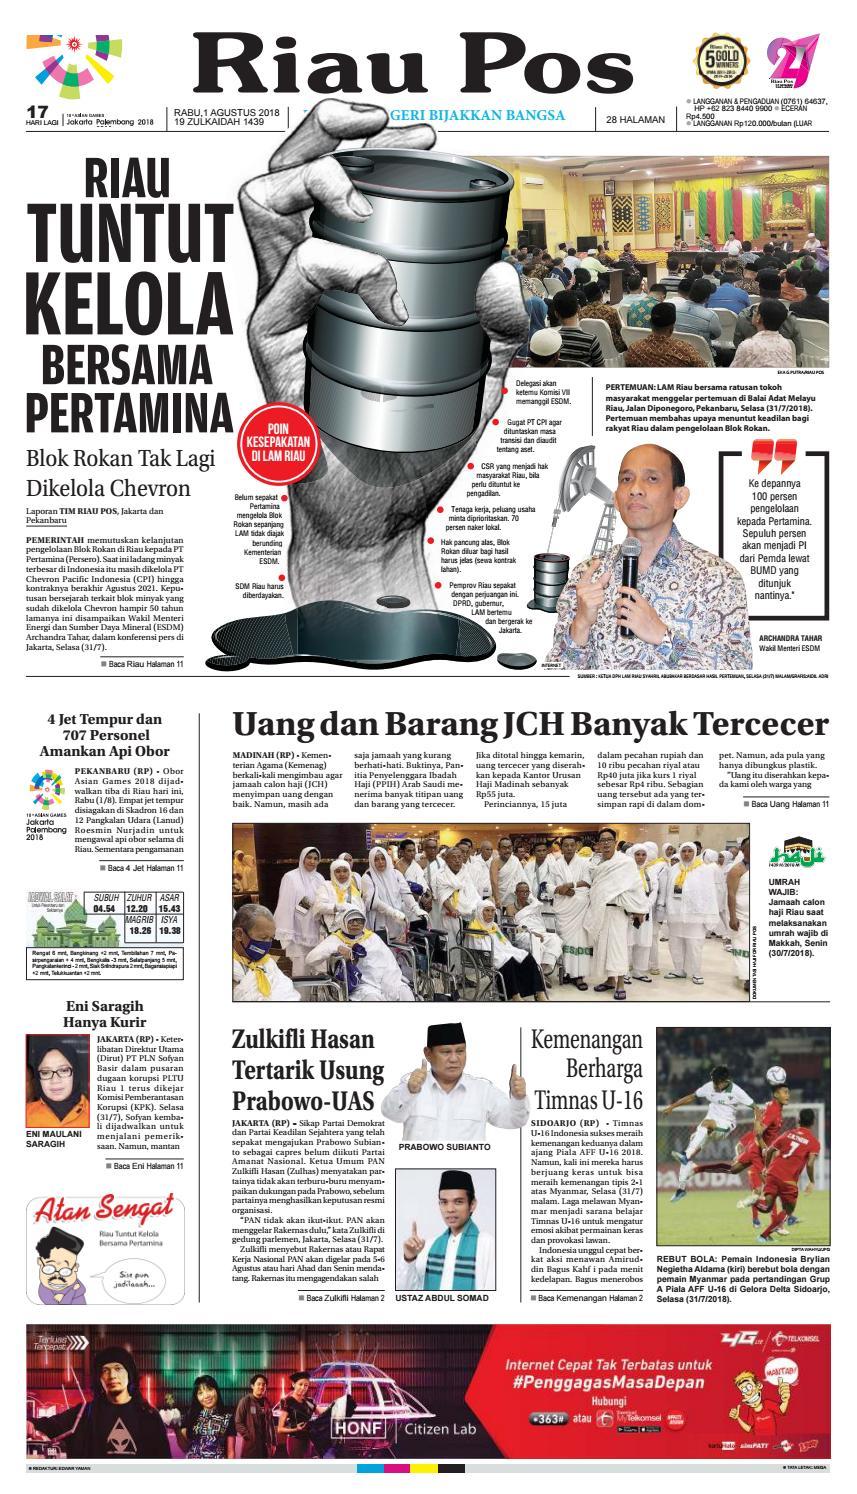 Riau Pos Edisi 1 Agustus 2018 By Riau Pos Issuu